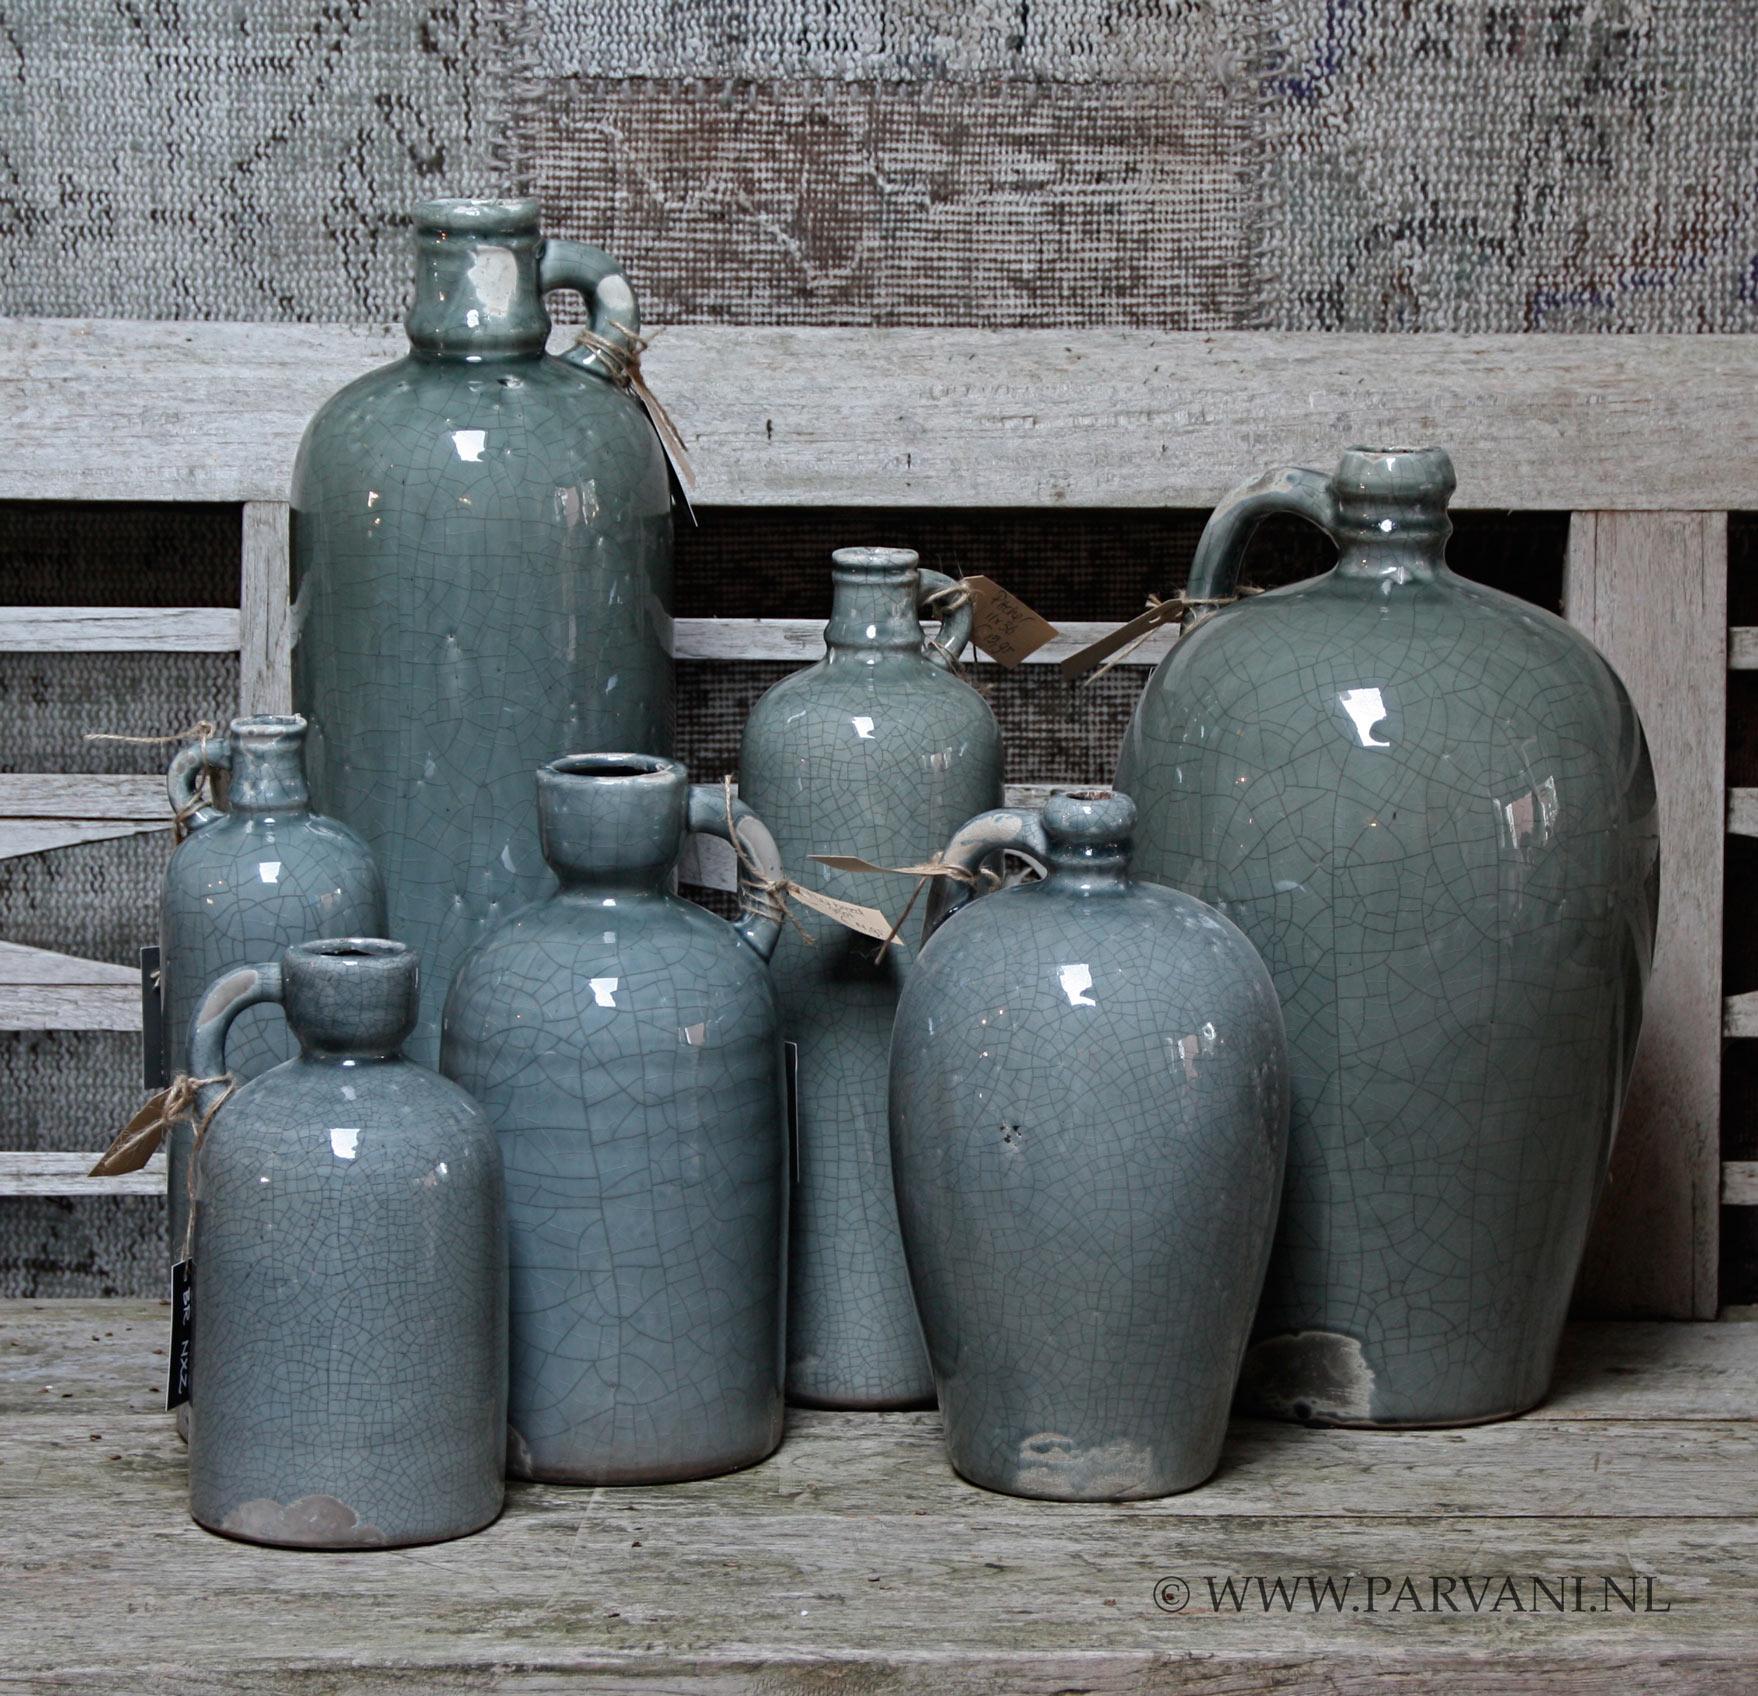 Parvani  Vazen-groen-grijs-Brynxz-flessen-potten-blauw